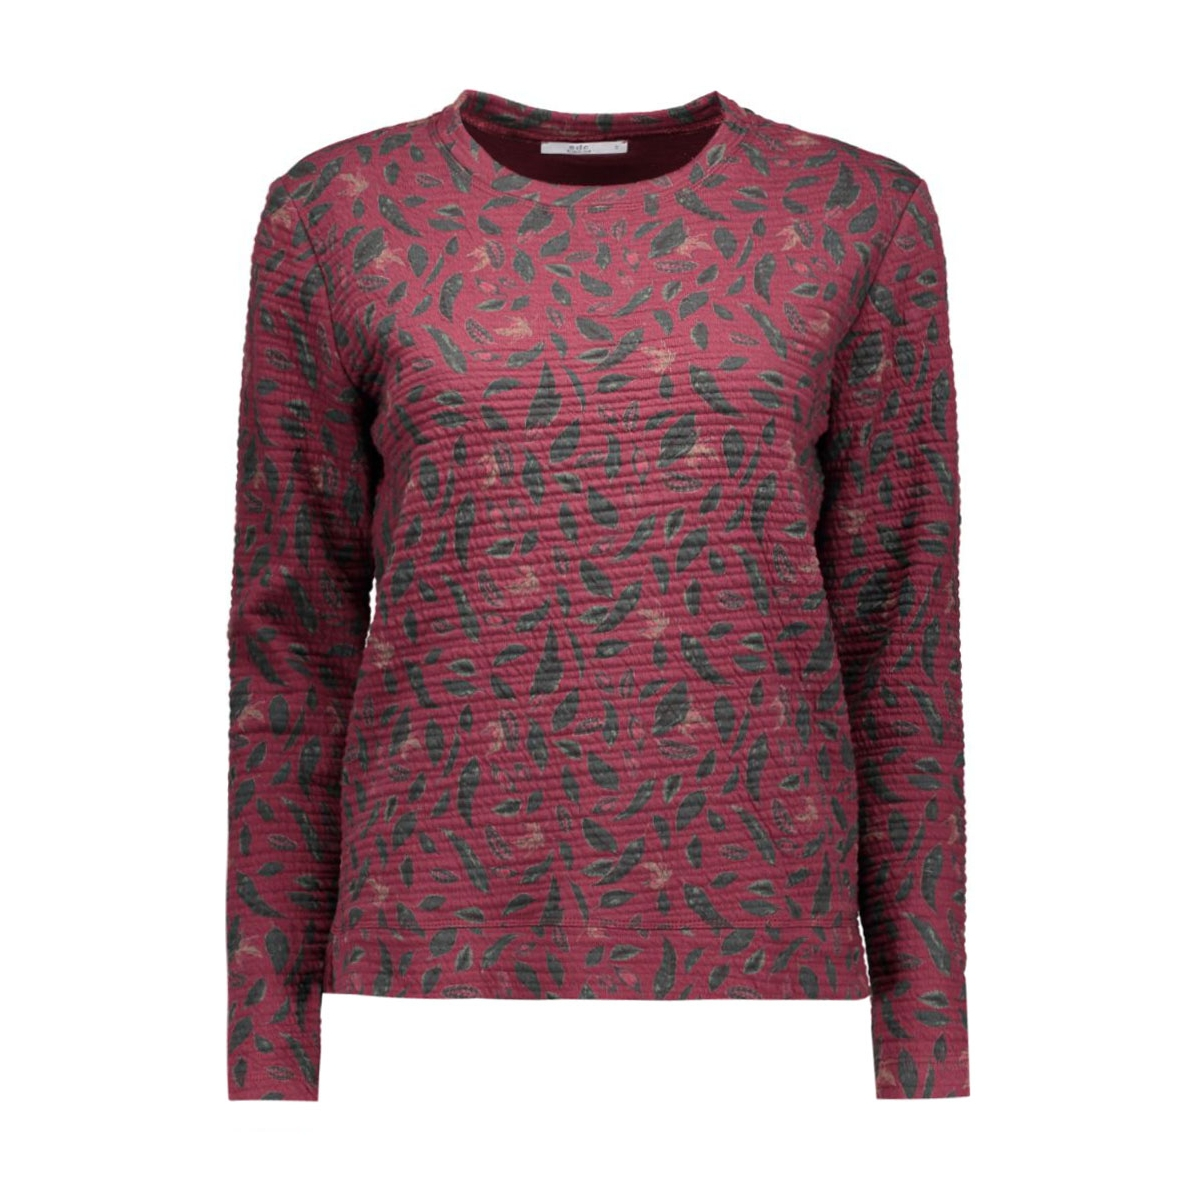 096cc1j011 edc sweater c620